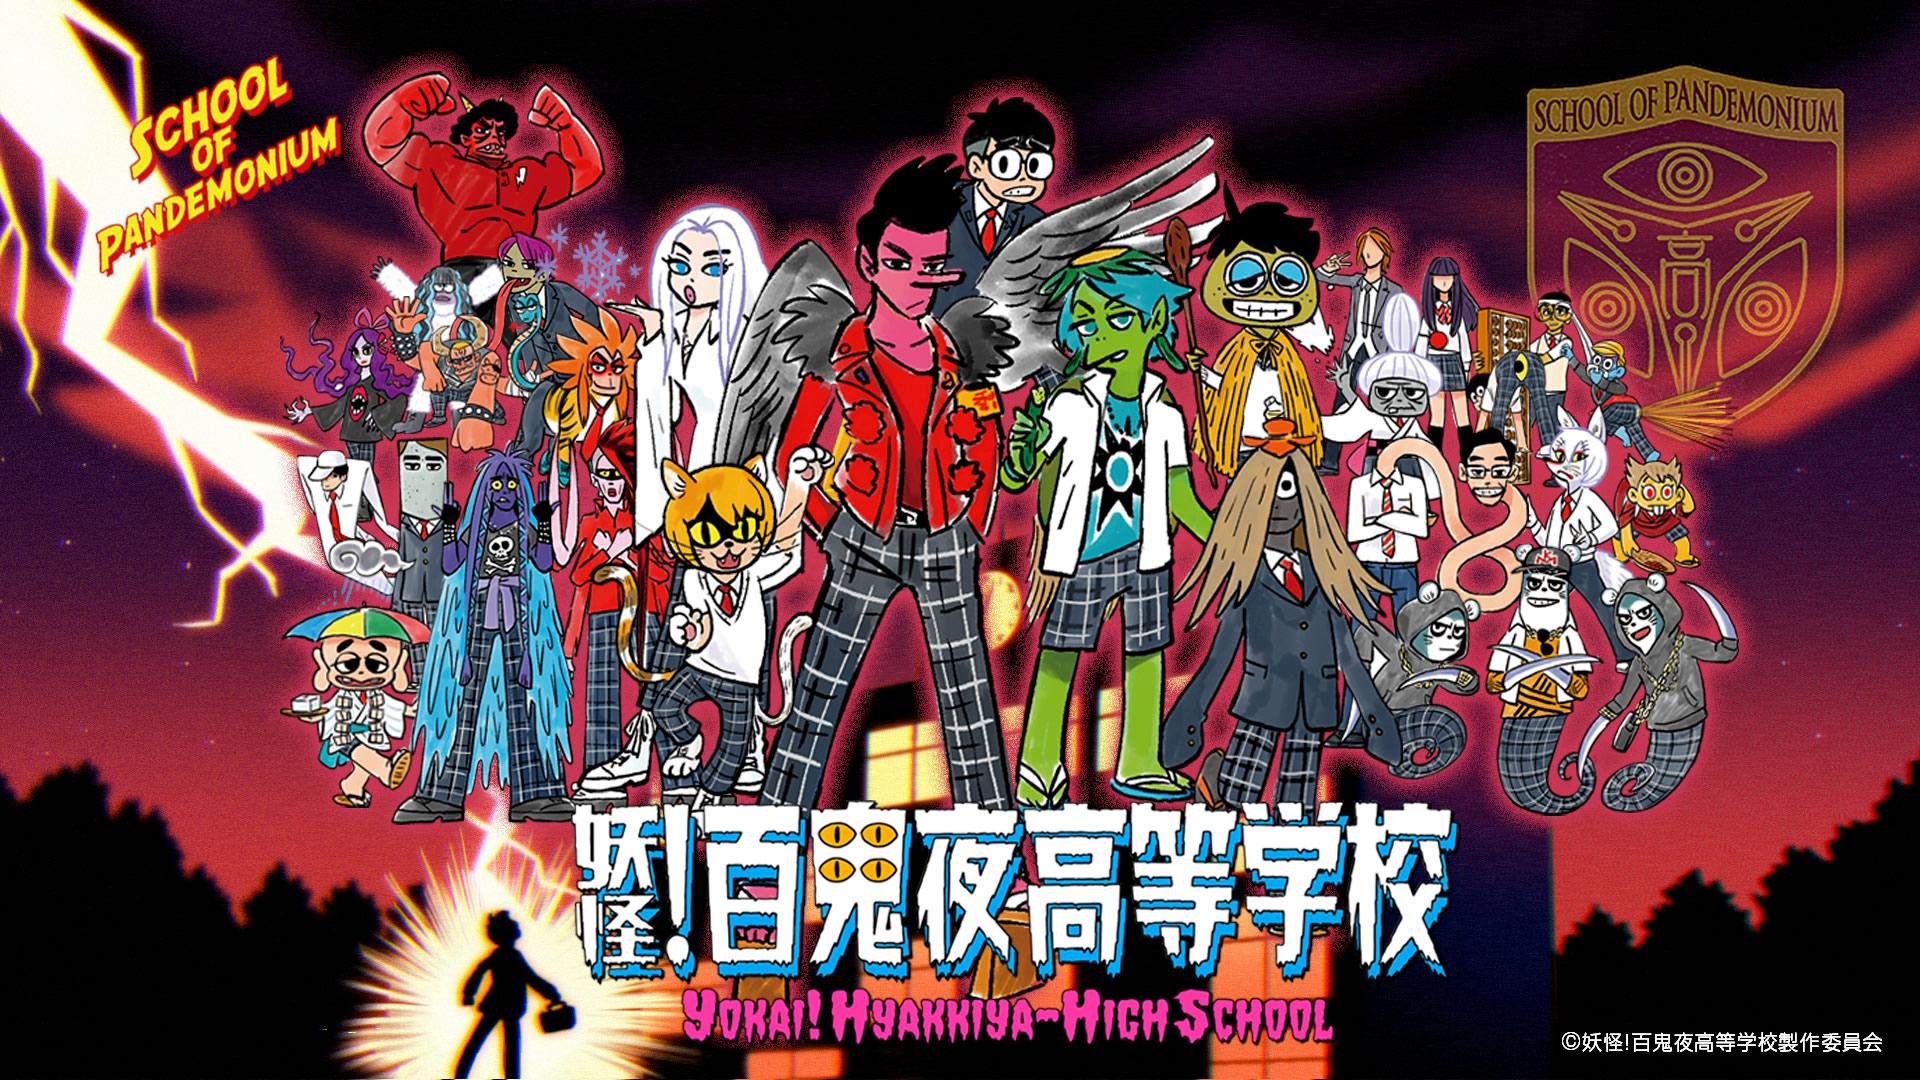 妖怪!百鬼夜高等学校 公式サイト